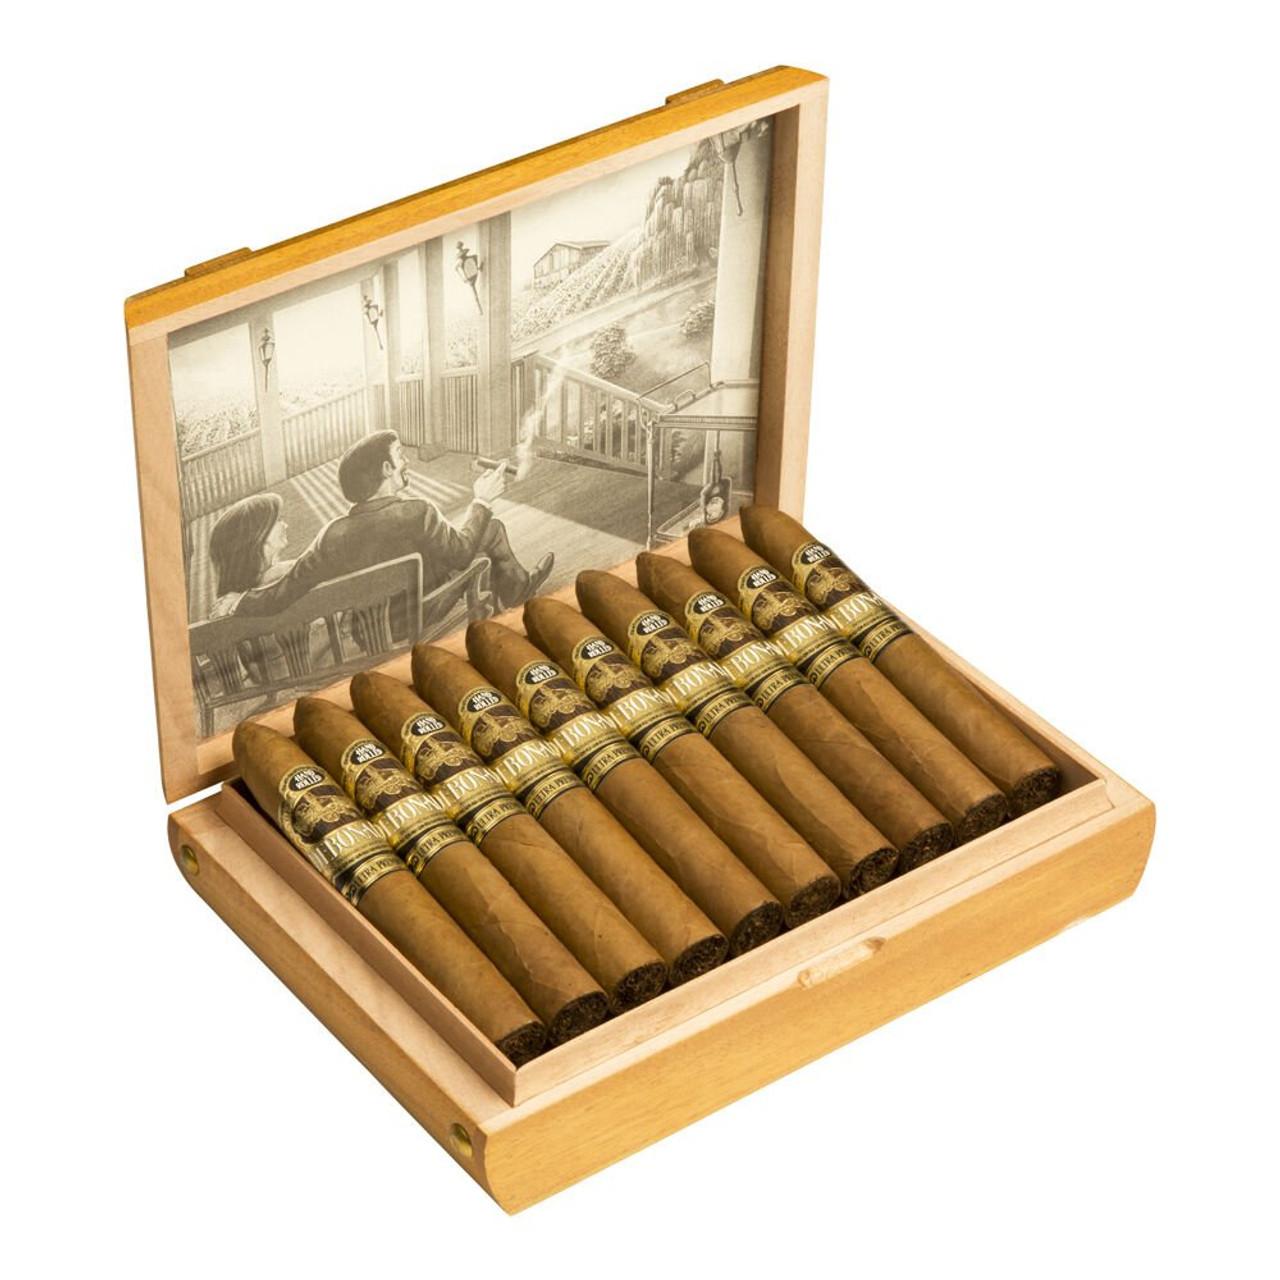 Debonaire Daybreak Petite Lancero Cigars - 5.5 x 38 (Box of 20)